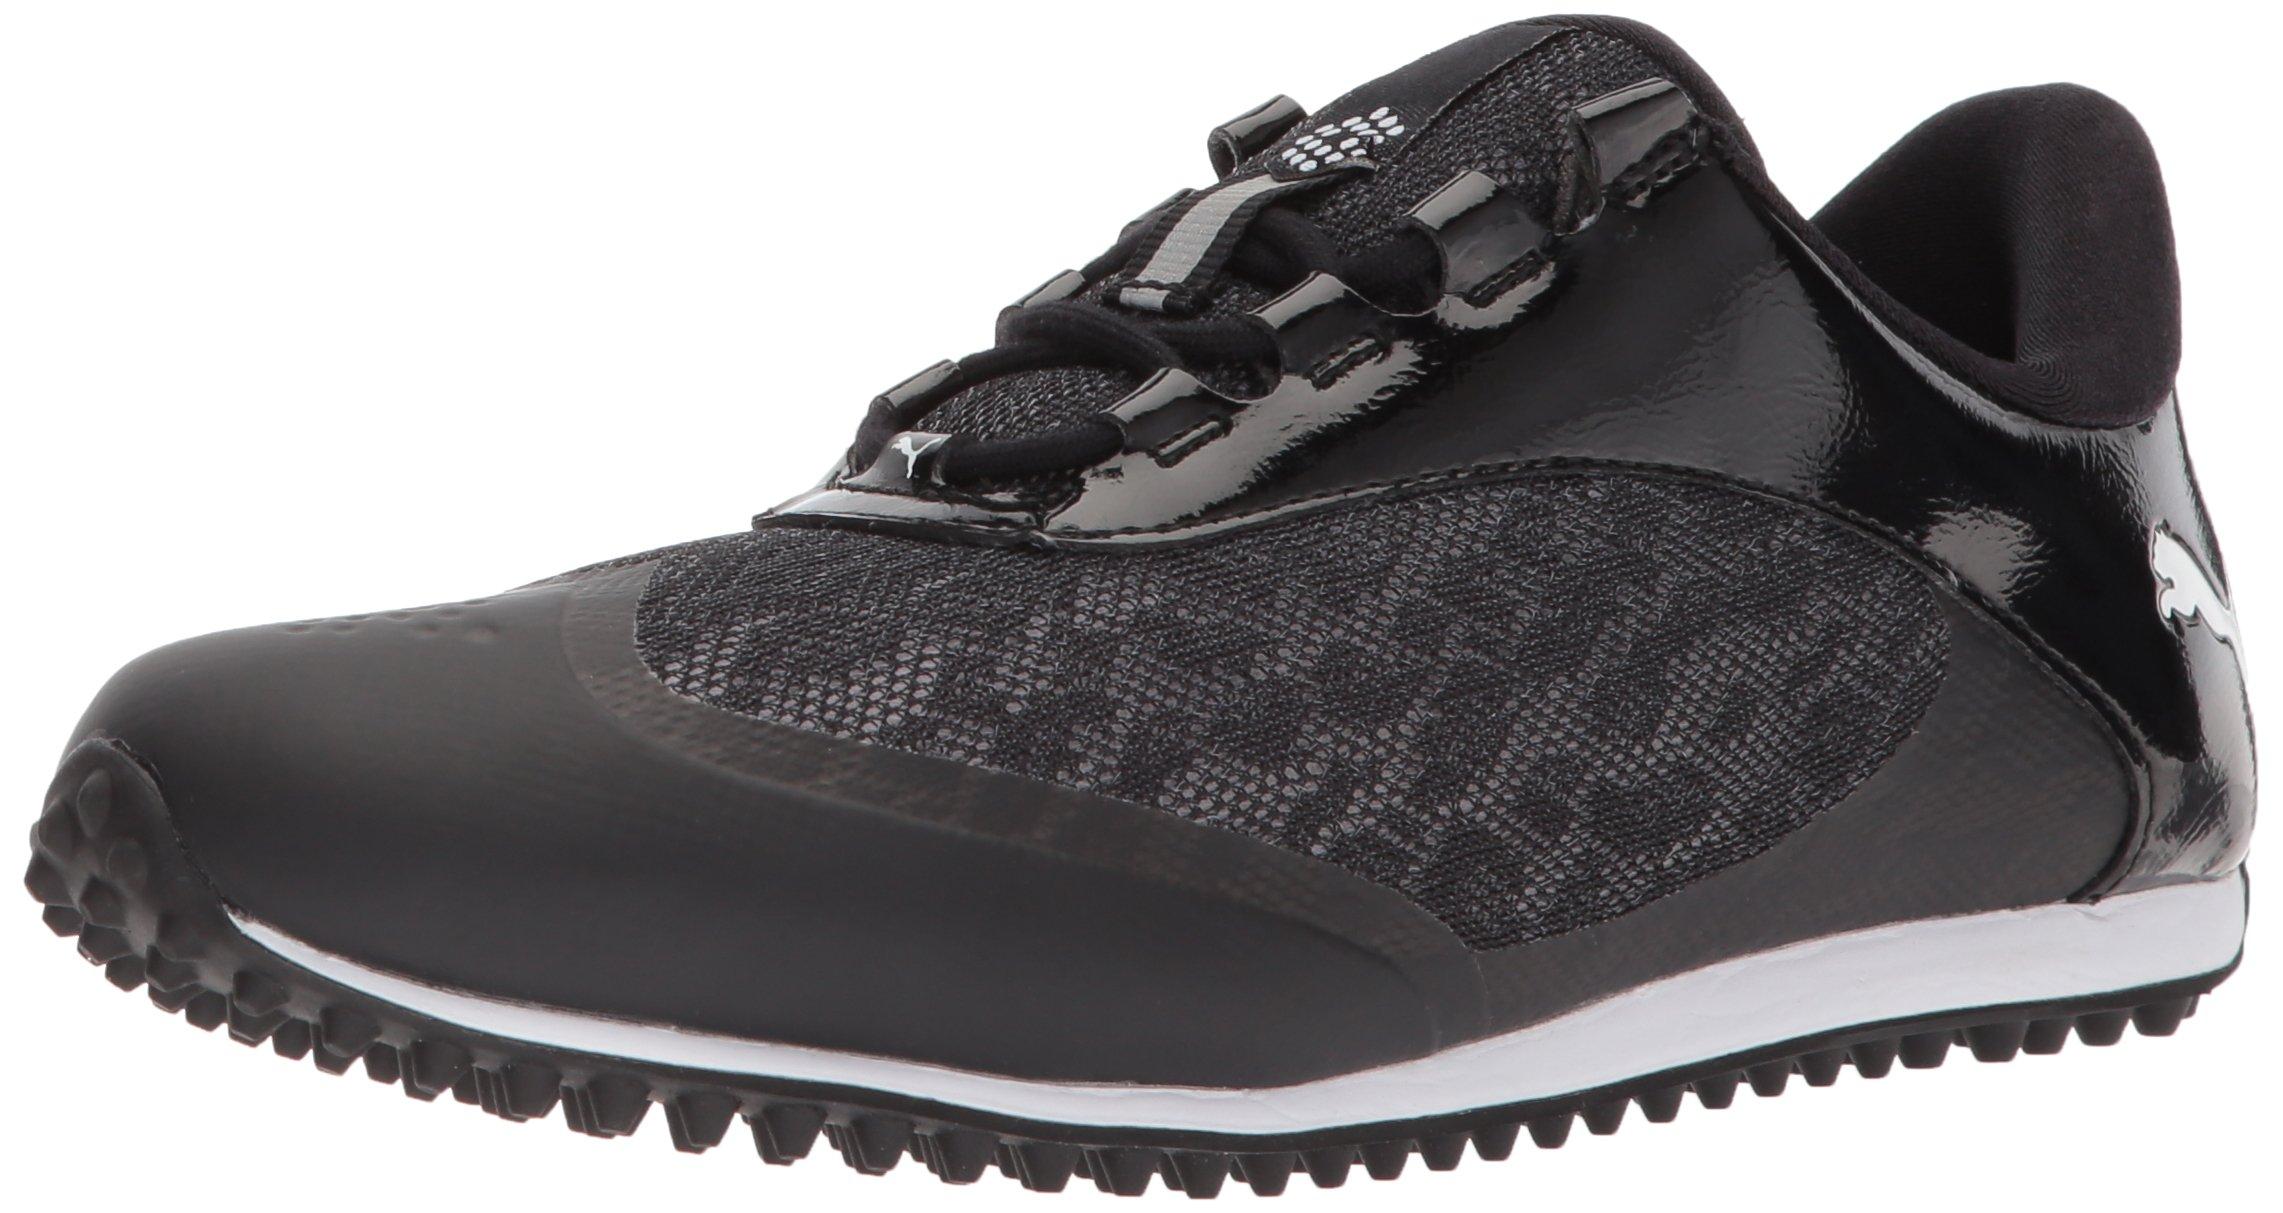 PUMA Golf Women's Summercat Sport Golf Shoe, Black/White, 8 Medium US